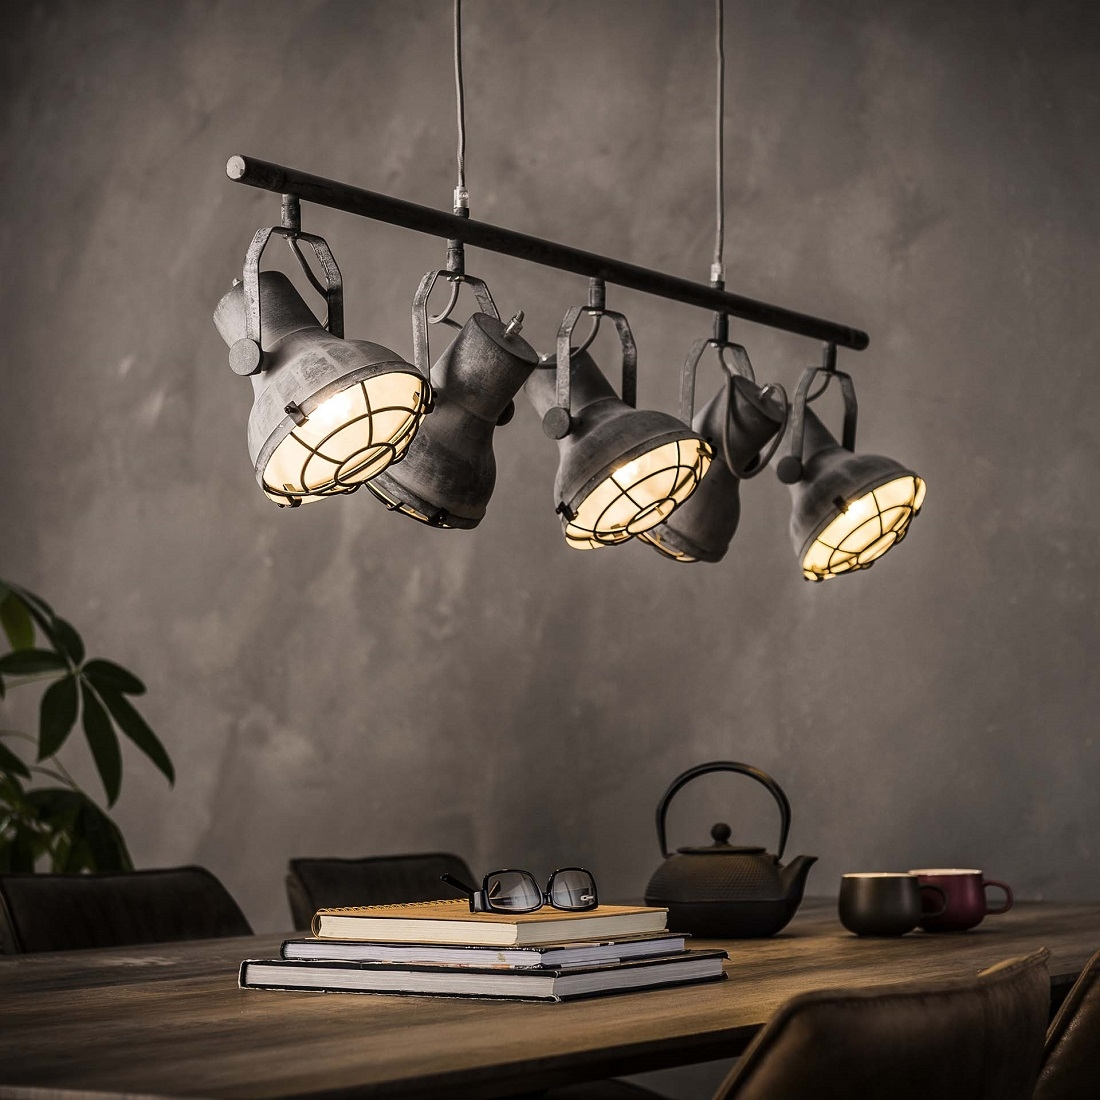 Hanglamp Feridun 5LxØ16 van 120 cm breed - Grijs